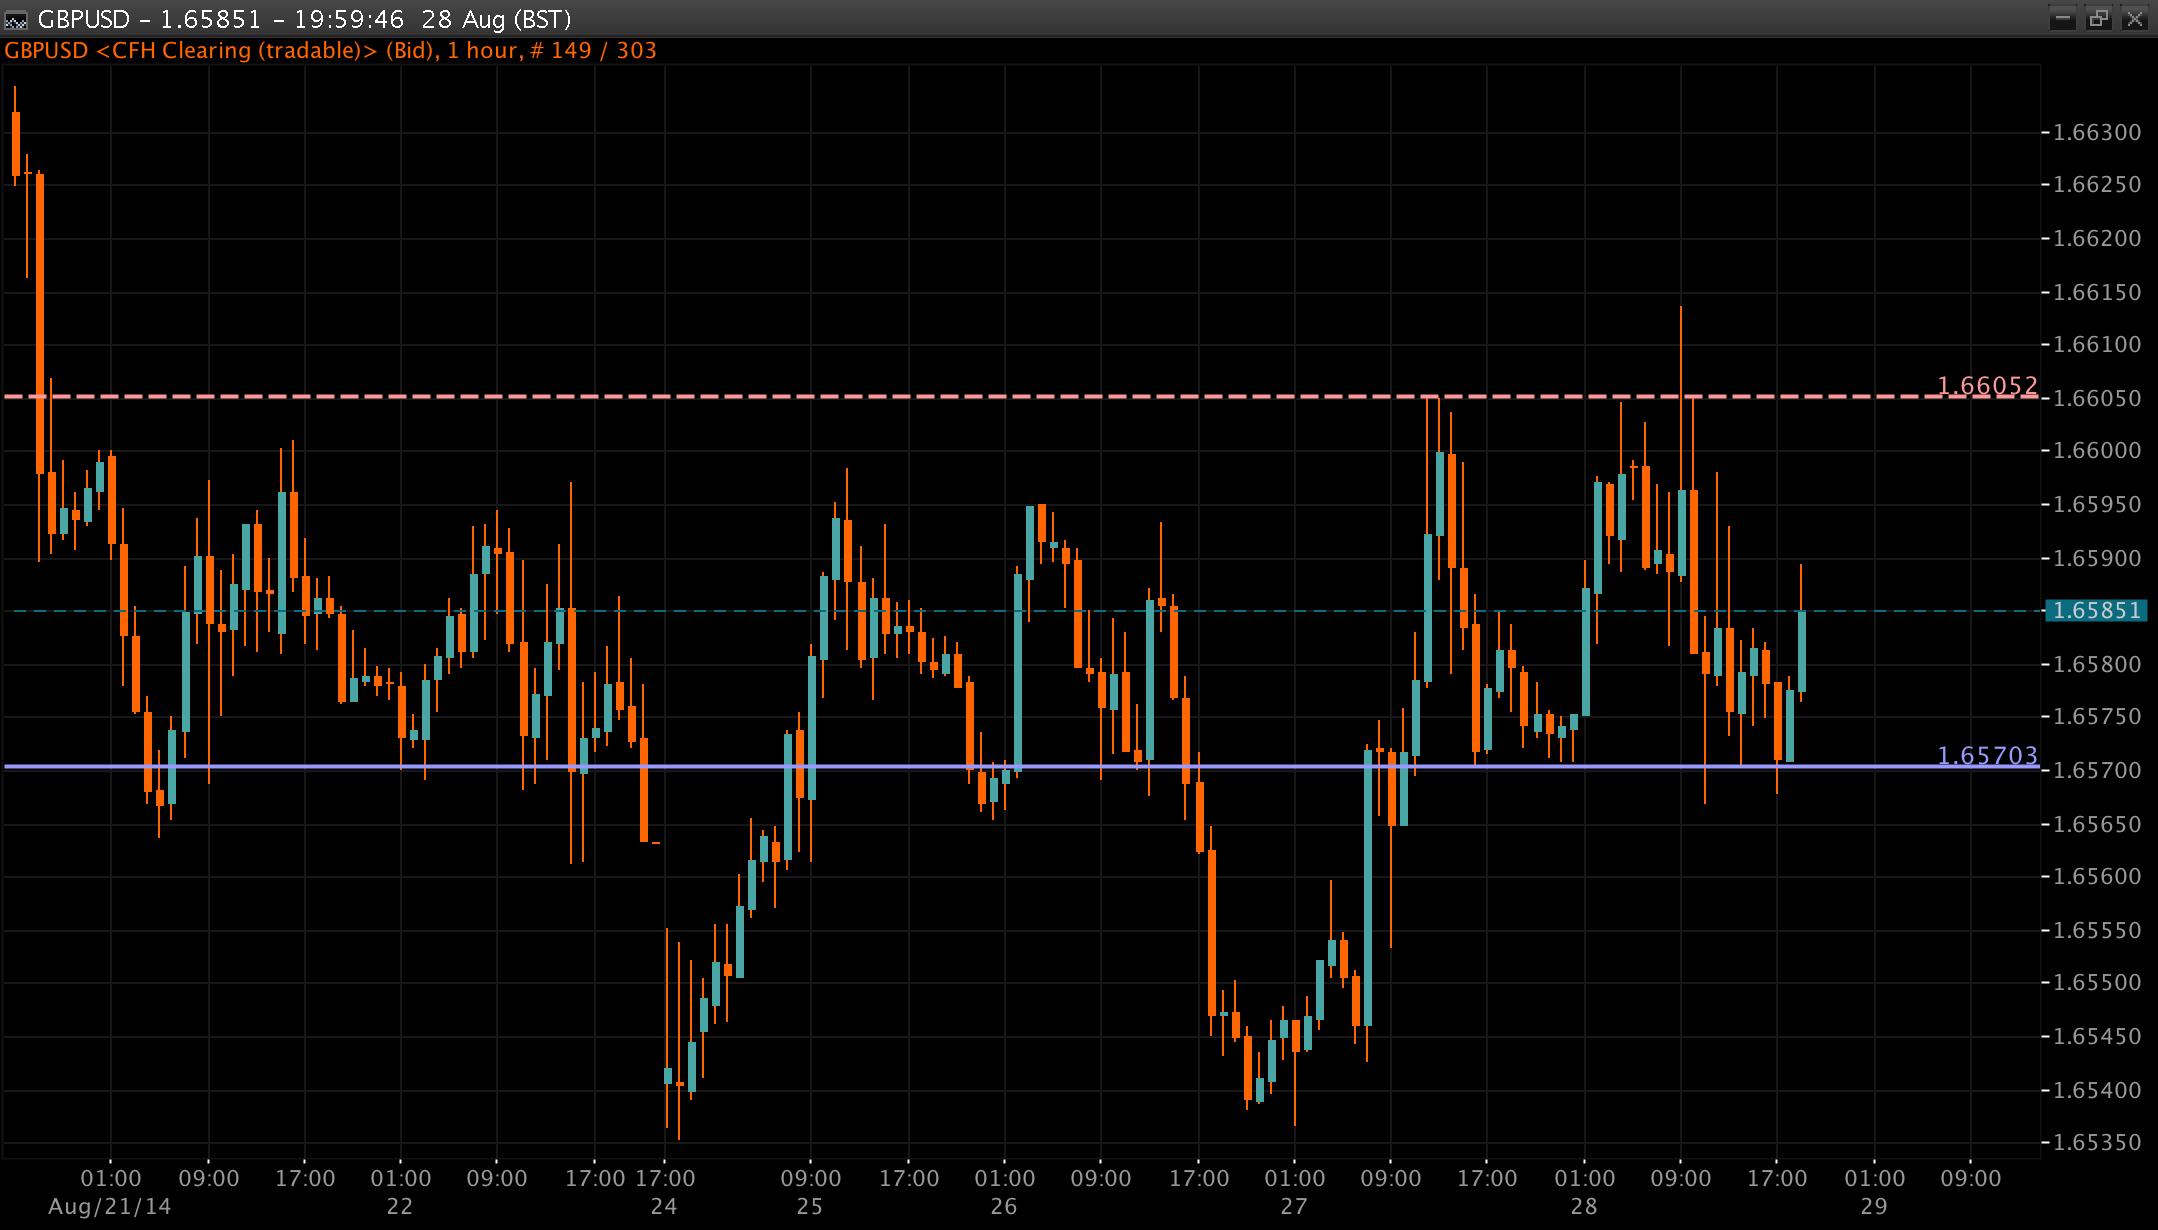 GBP/USD Chart 29 Aug 2014